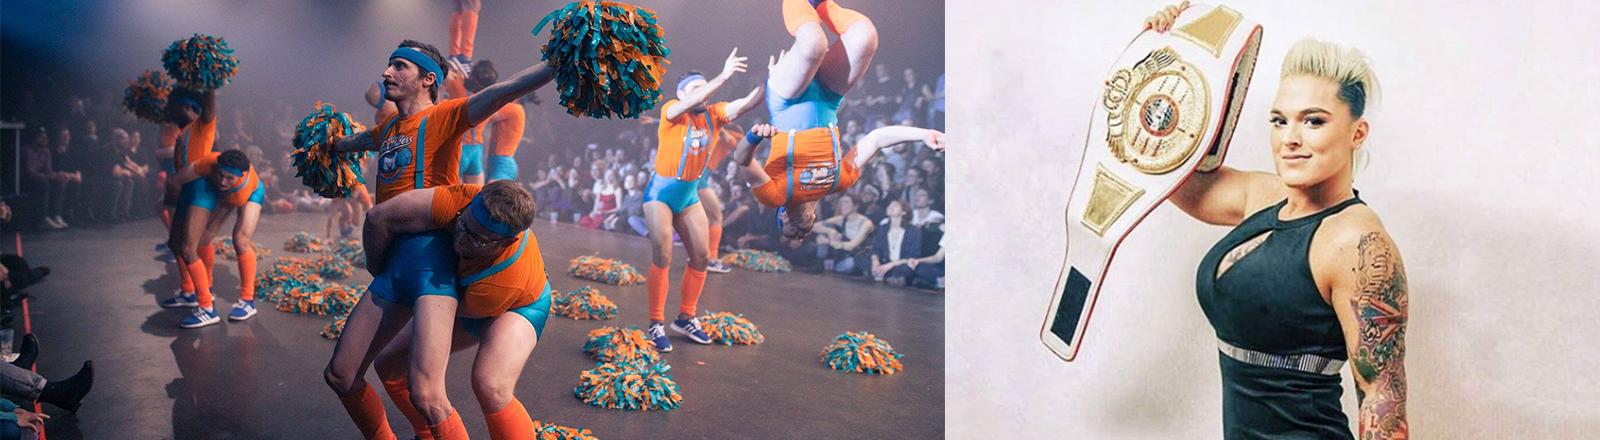 Männer als Cheerleaders Frau mit Wrestlinggürtel